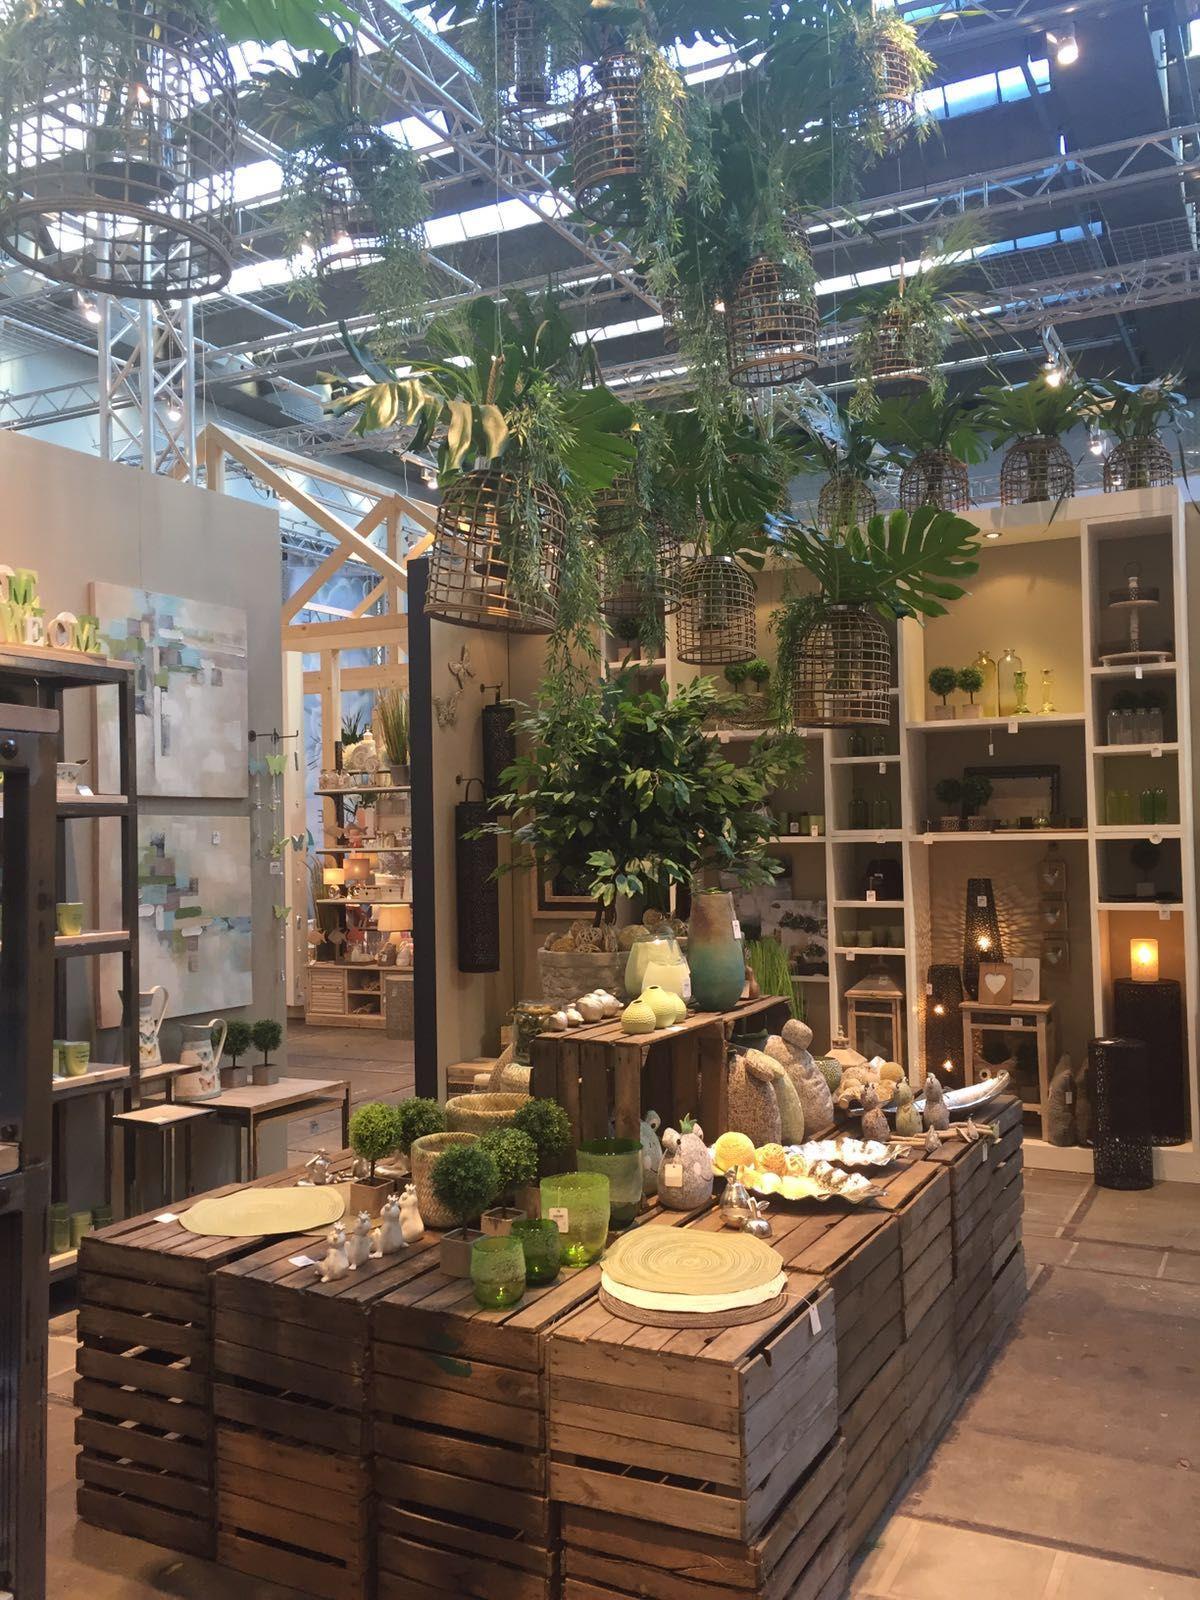 Boltze Gruppe Tendence Messe In Frankfurt Shop In 2019